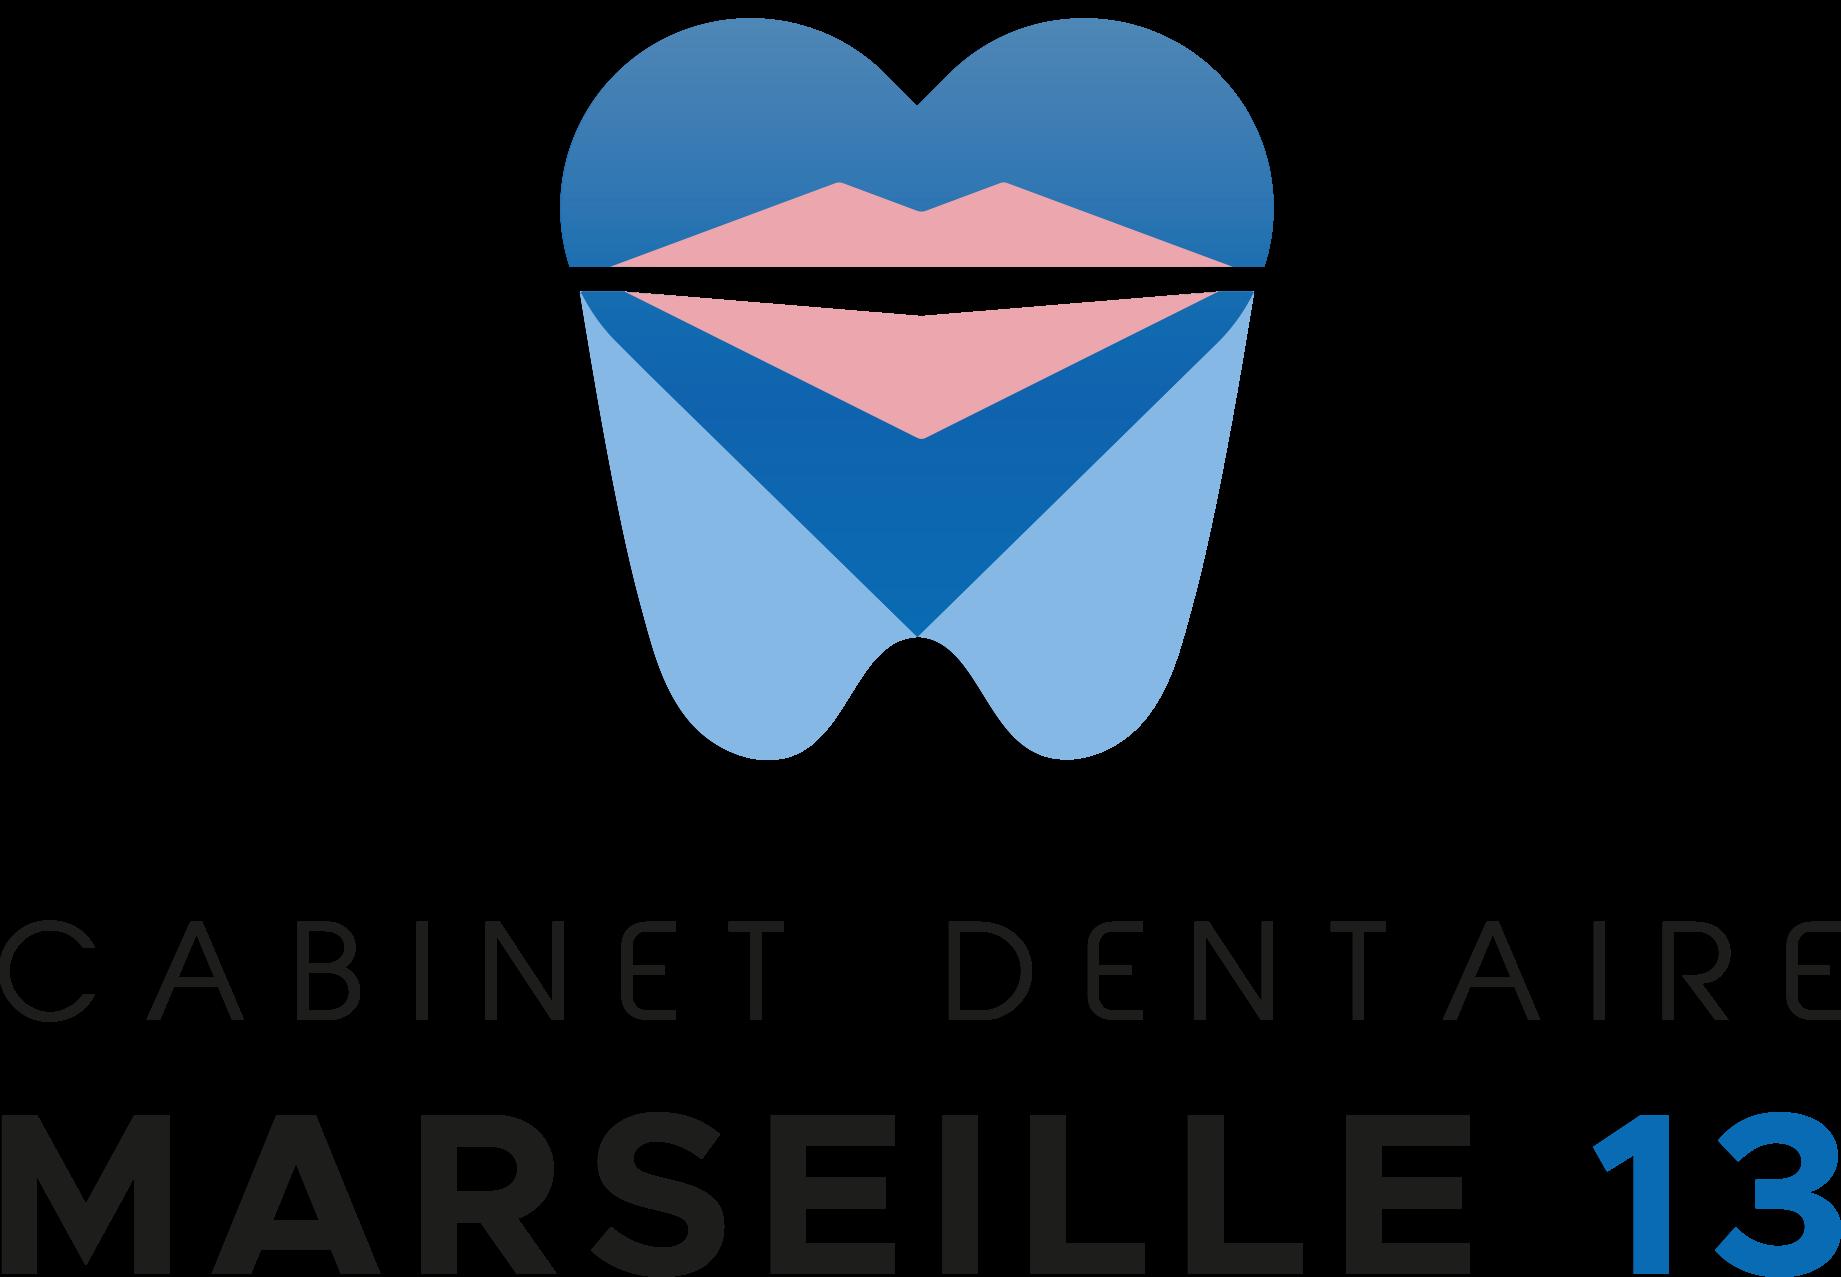 Cabinet Dentaire des Docteurs Londner, Haddad, Attias et Alqas-Toma